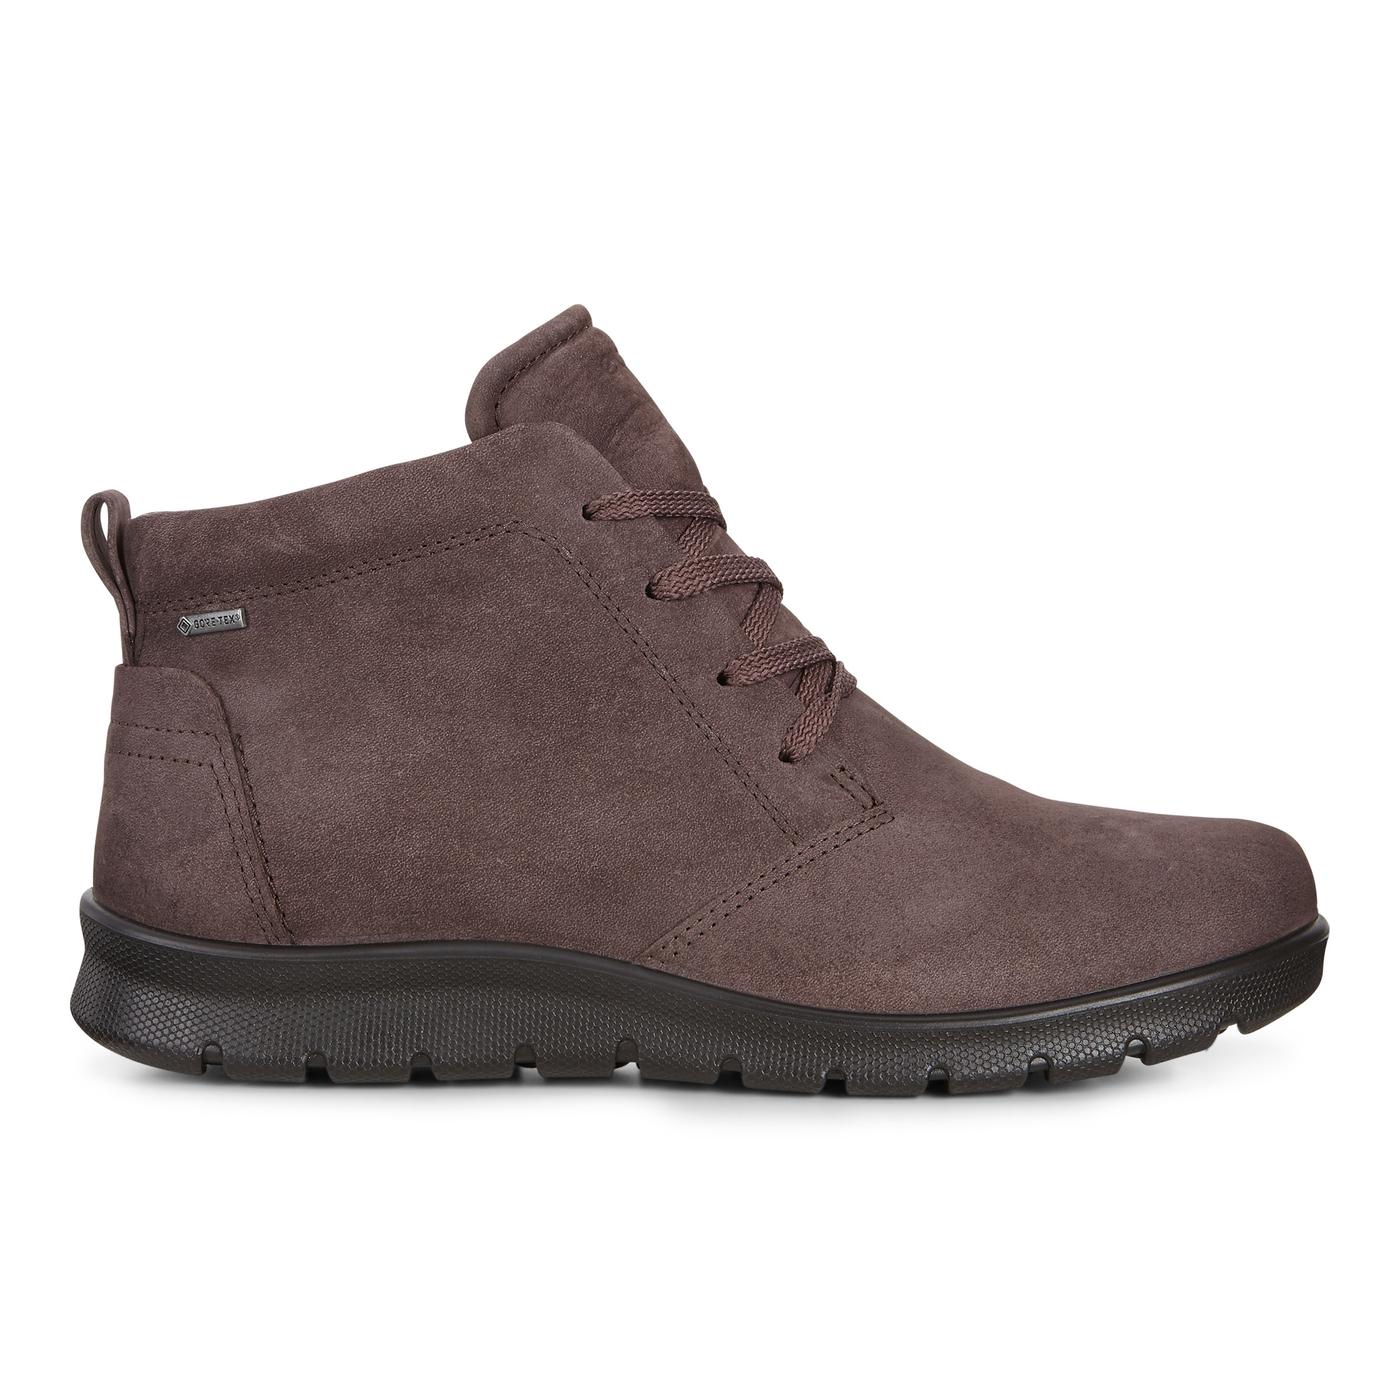 ECCO BABETT BOOT Ankle Boot